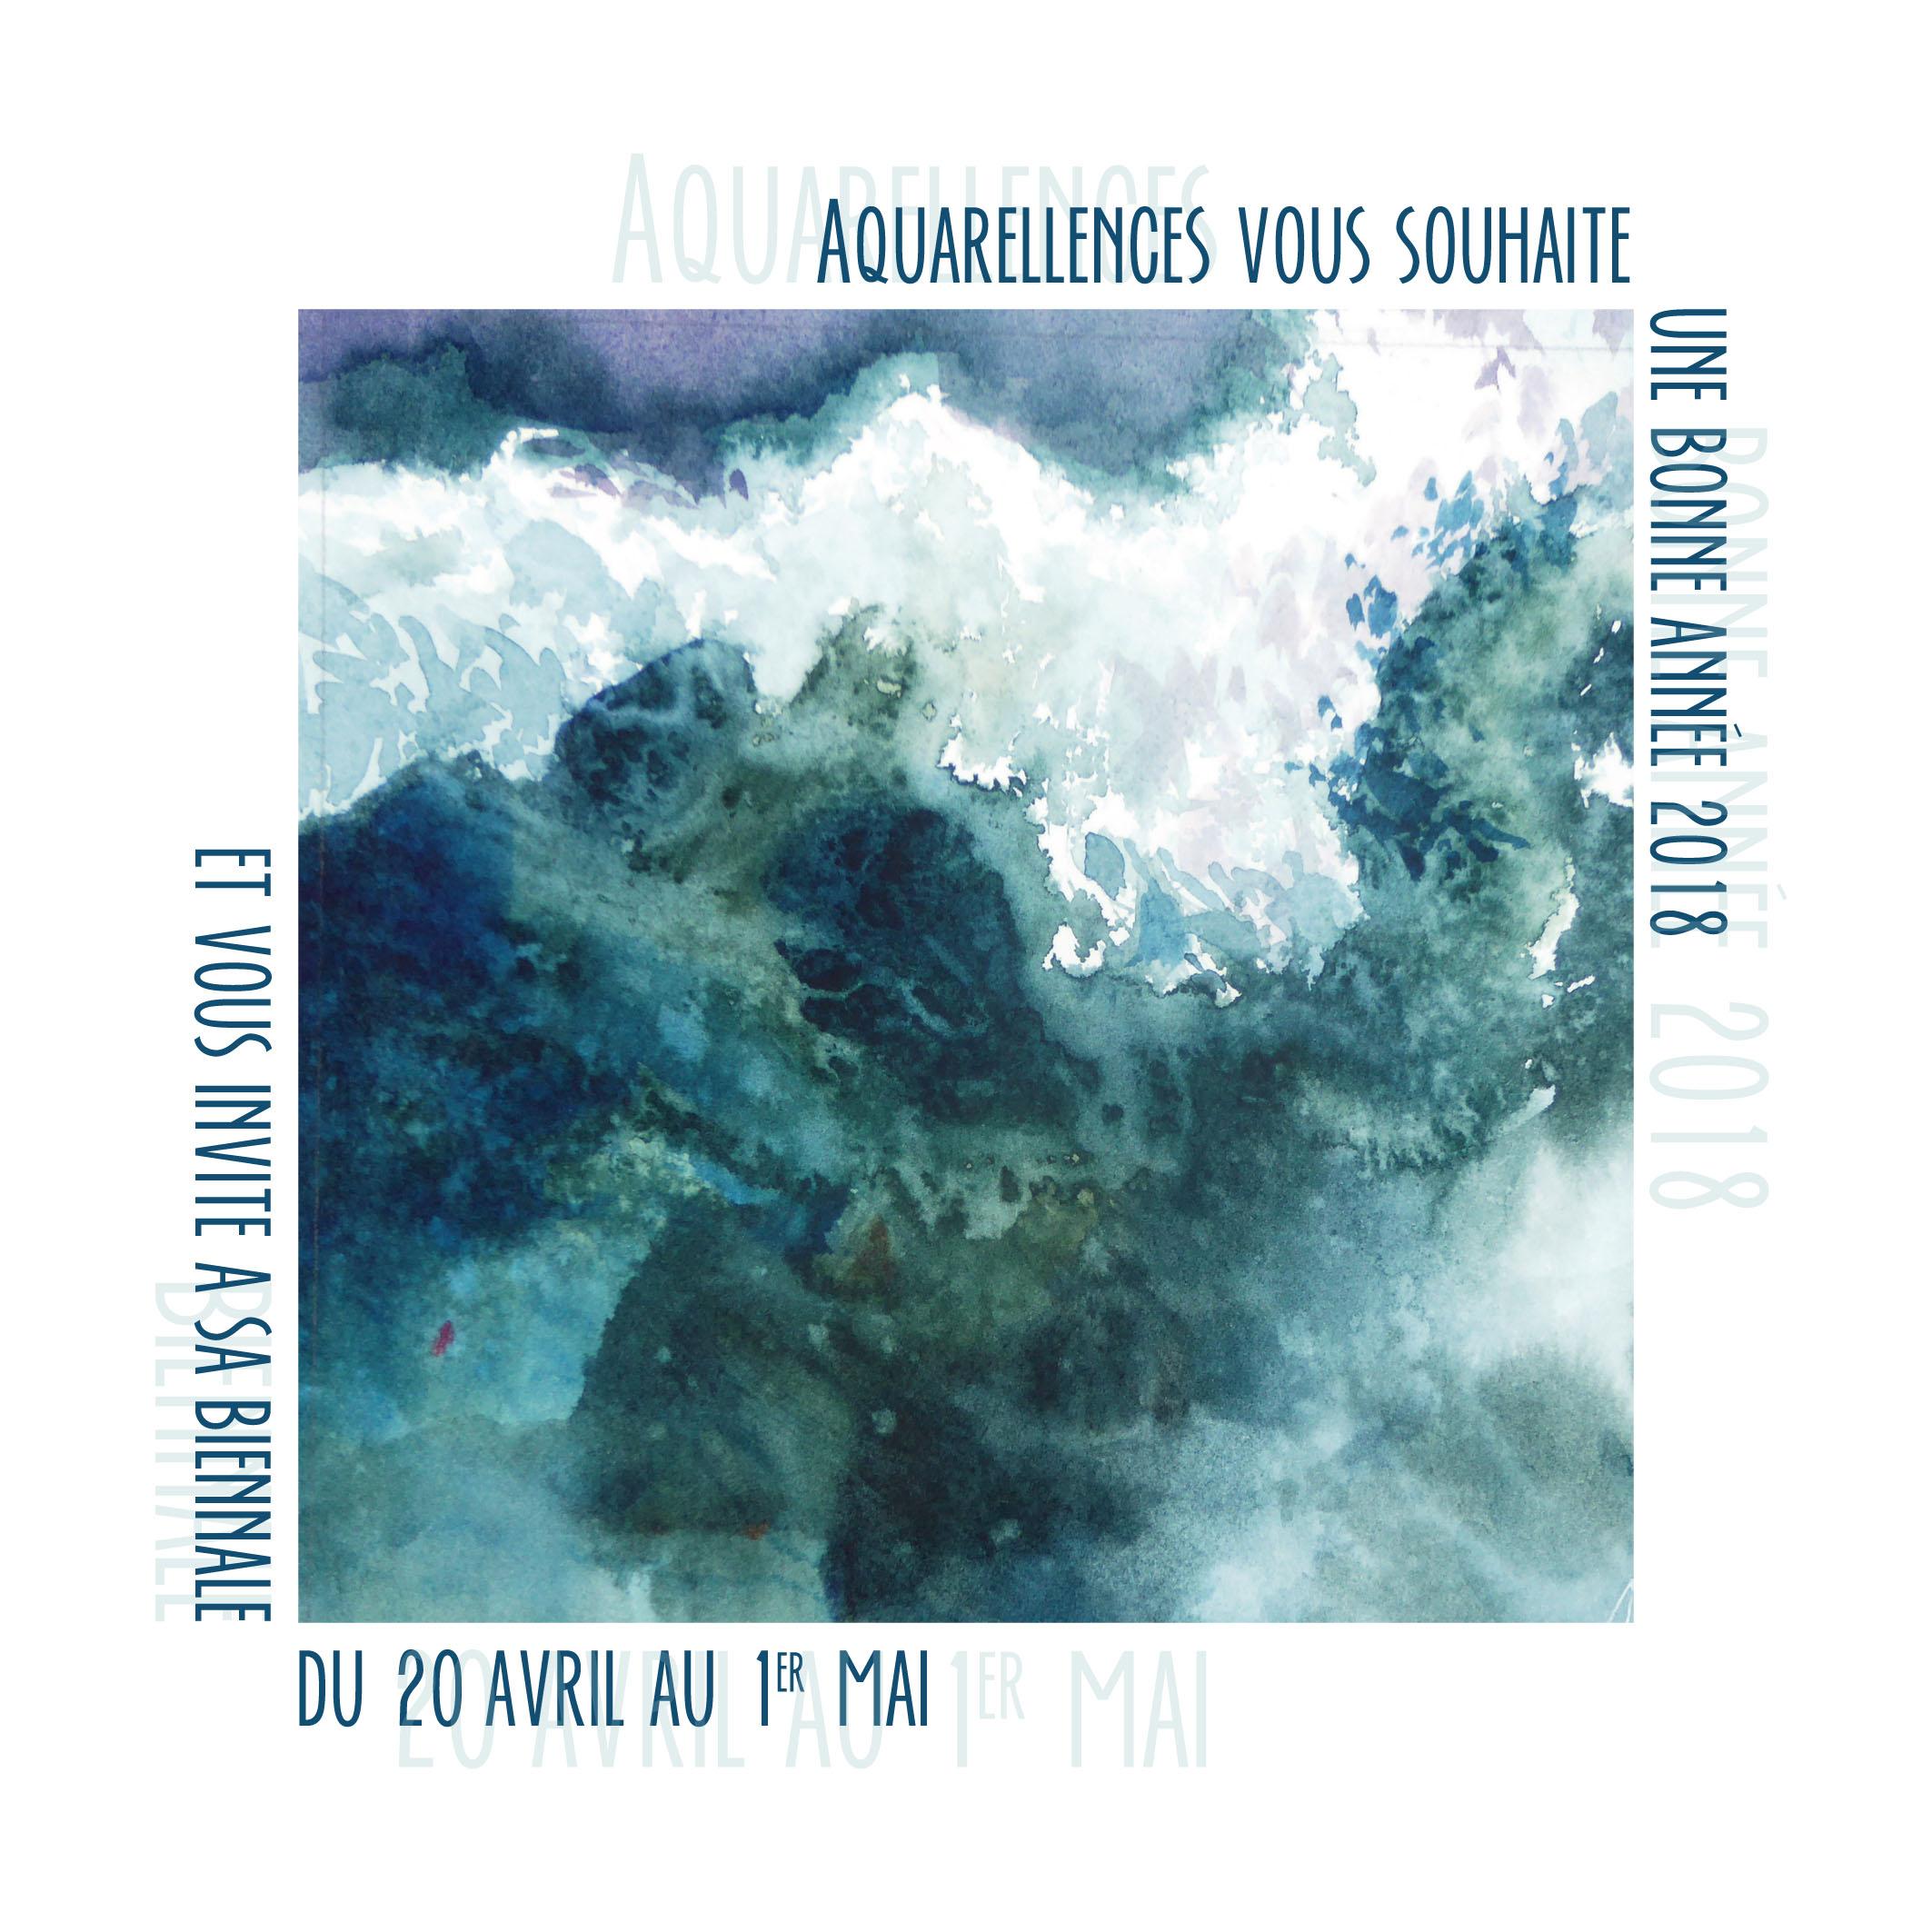 Voeux2018 Aquarellences